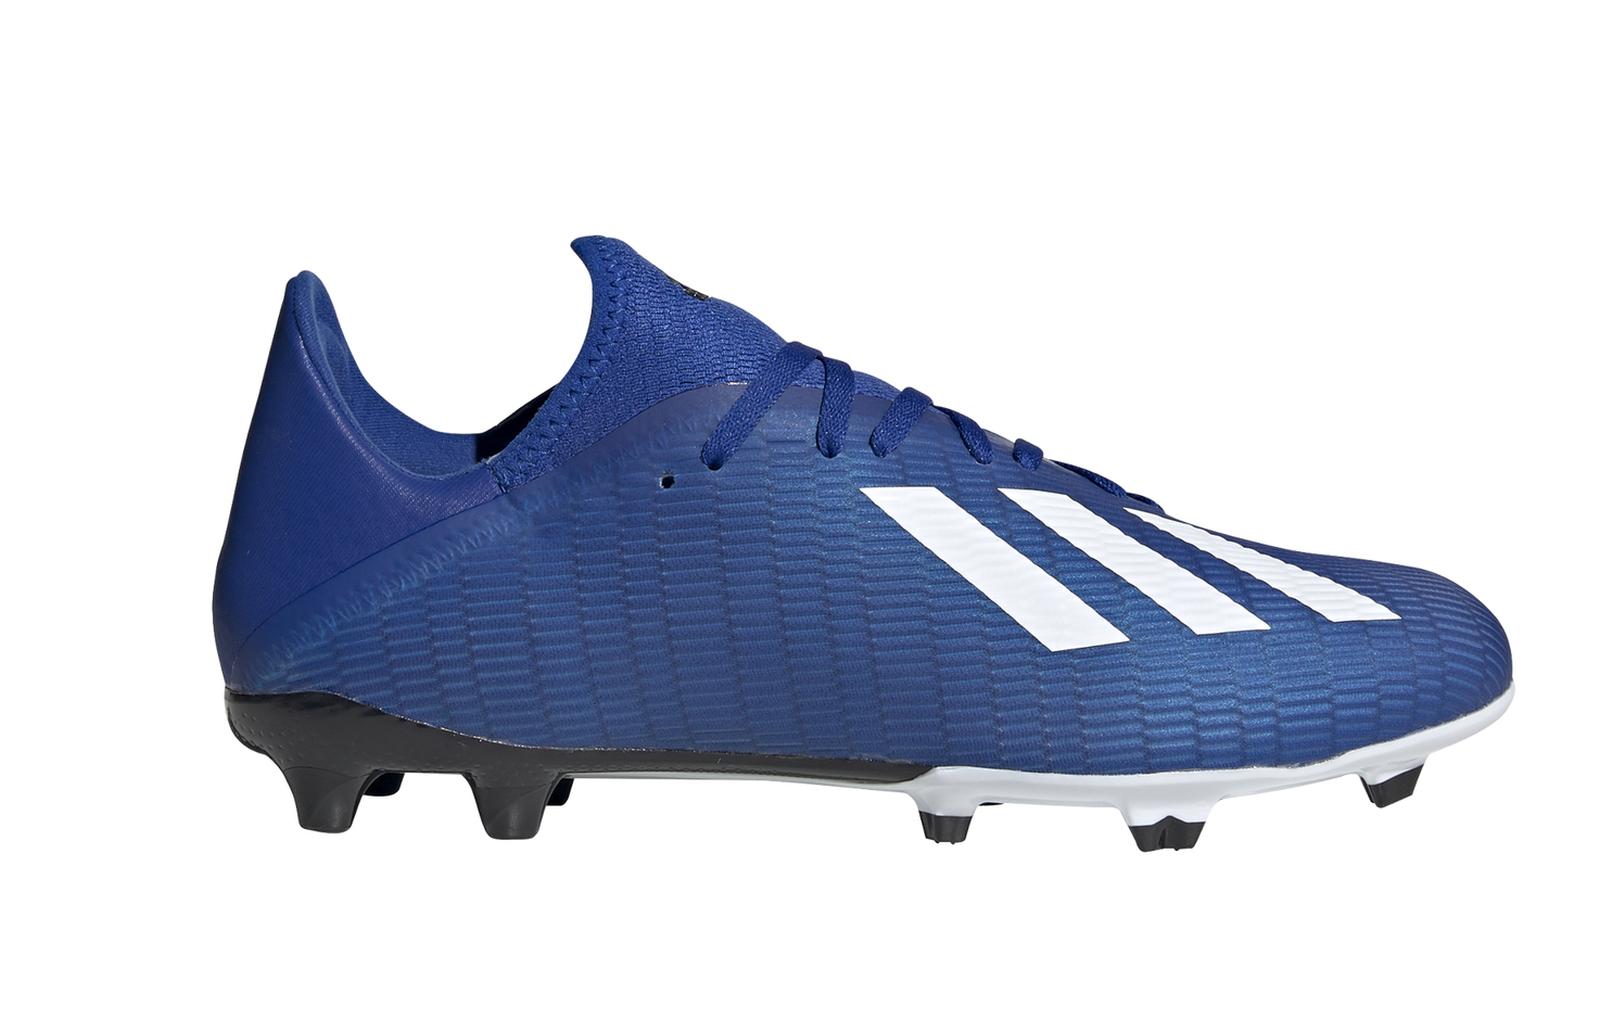 Adidas Performance Herren Nocken Fussballschuhe X 19.3 FG blau